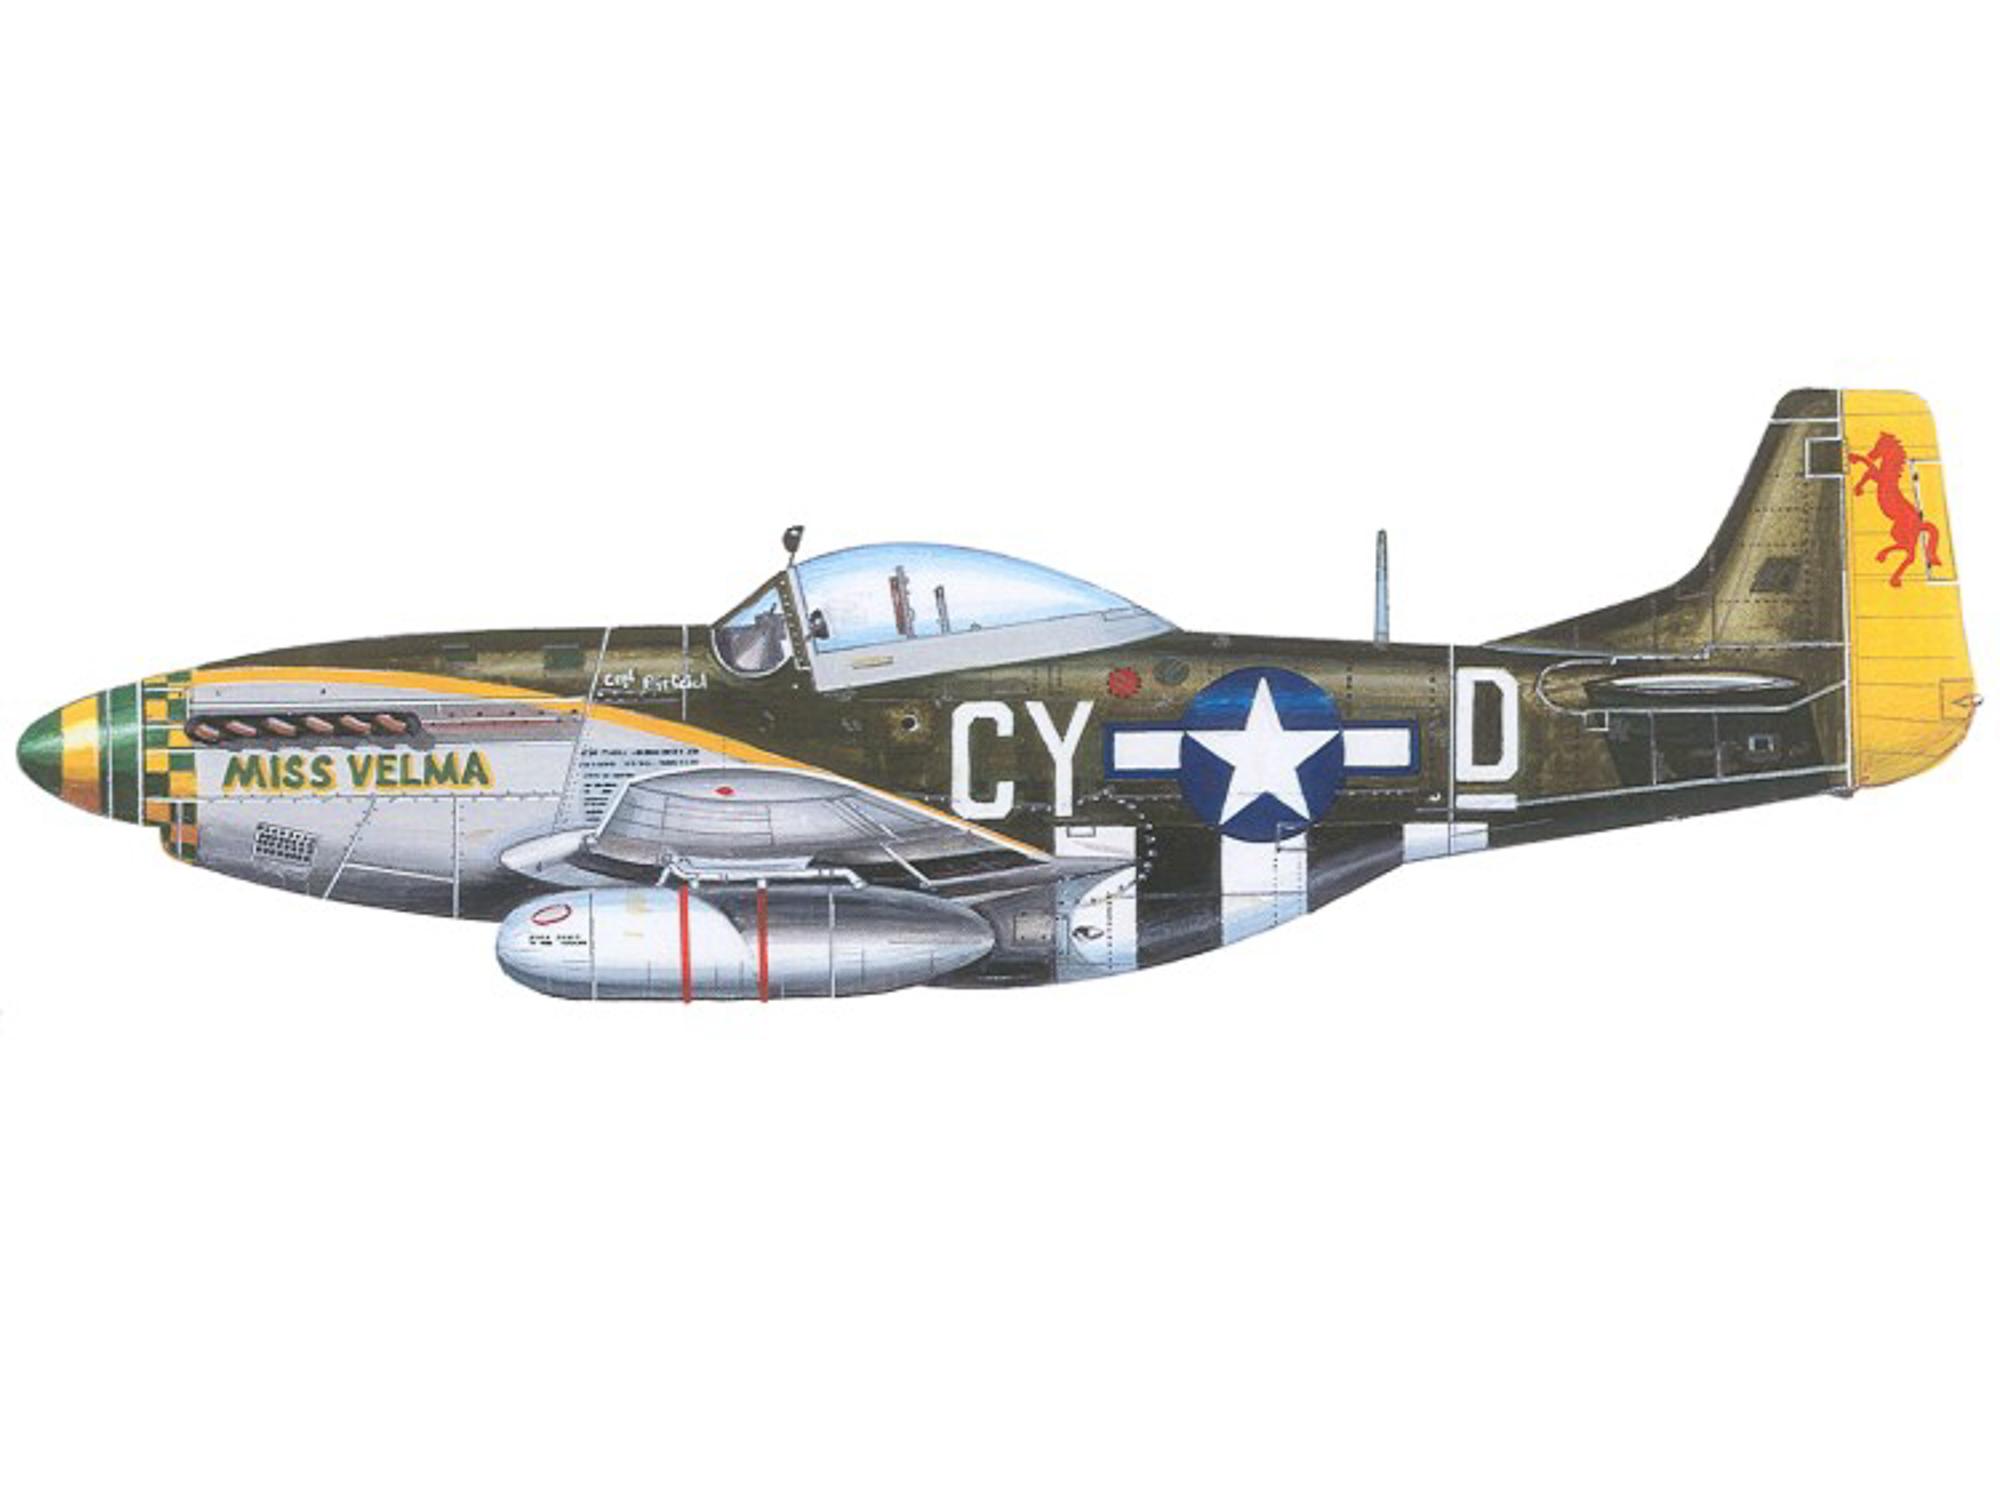 P-51D – Miss Velma – 44-72296